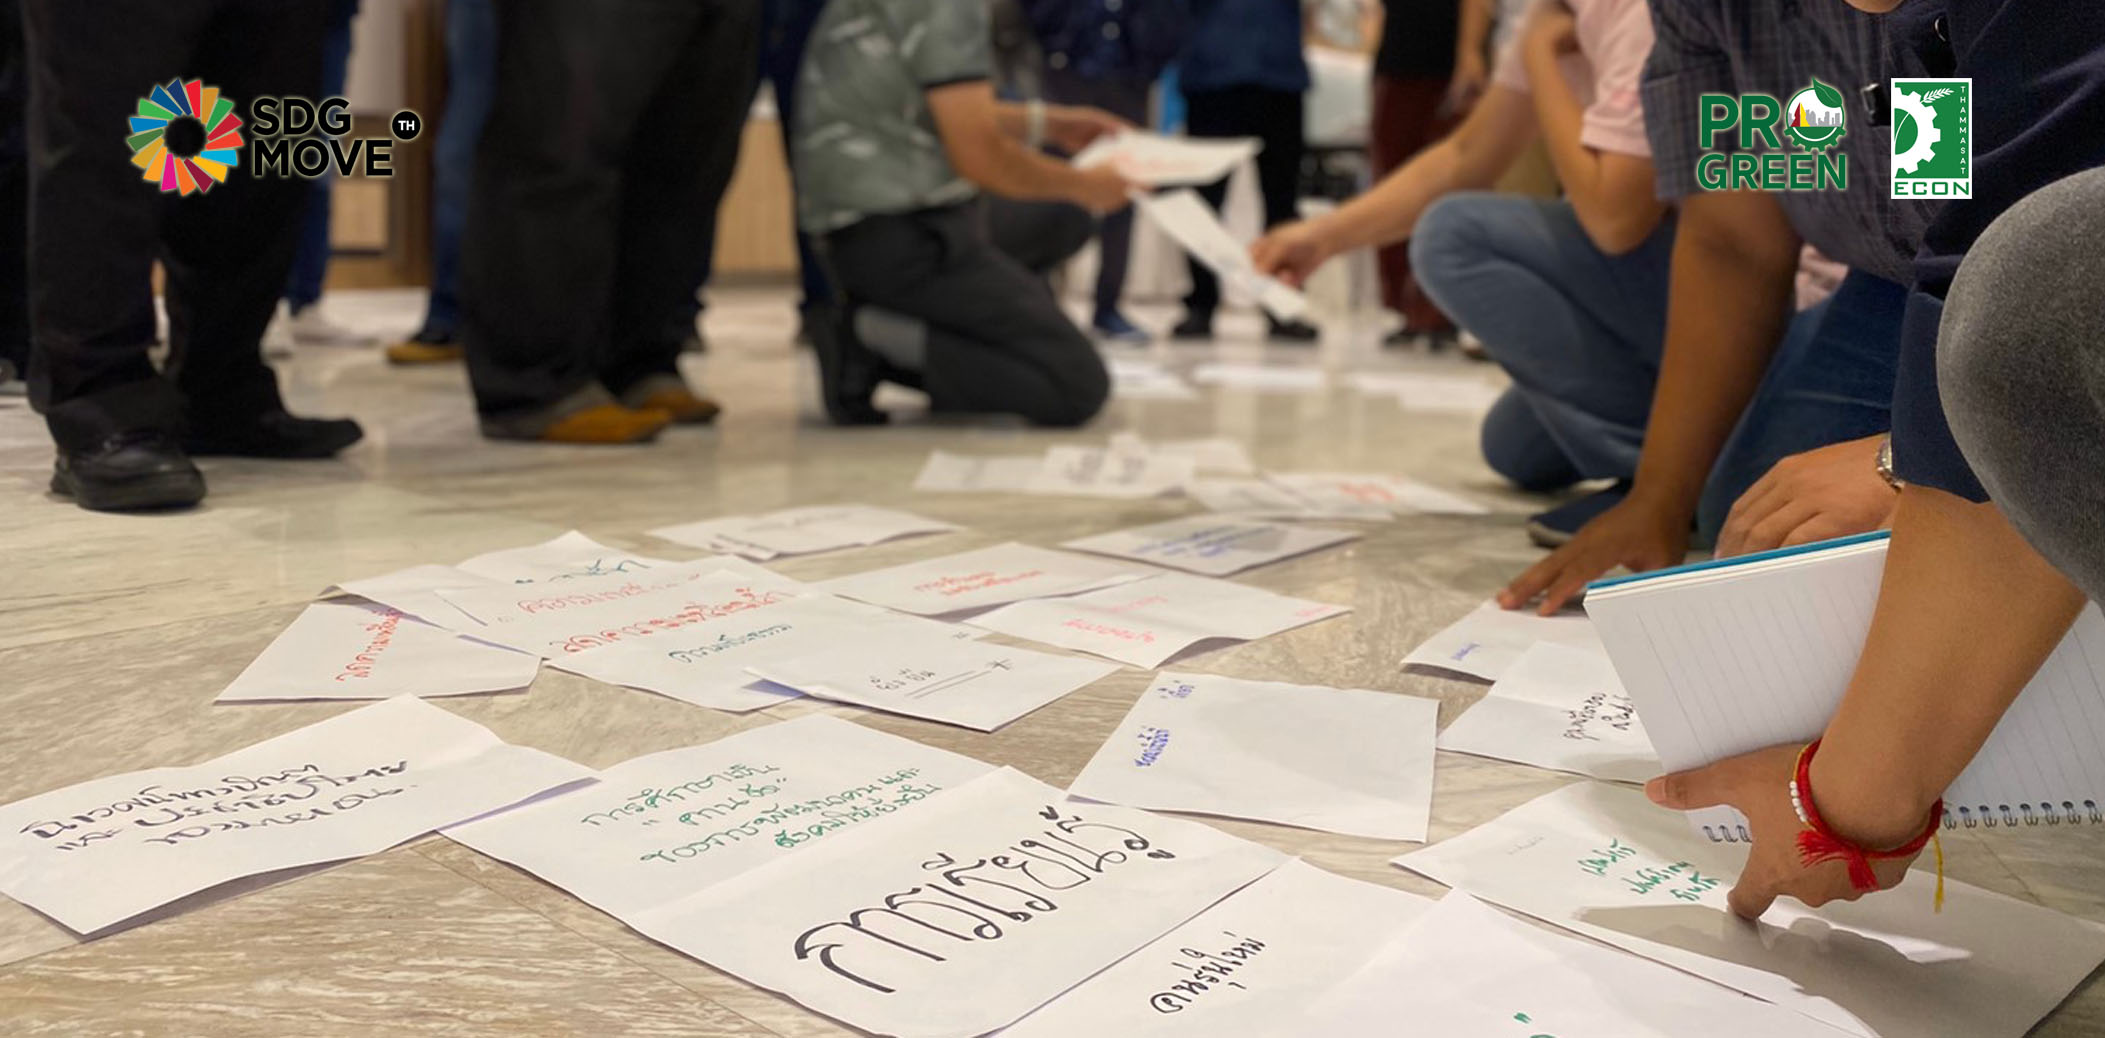 SDG Updates | SDG Move และ สกสว. จัดประชุมเชิงปฏิบัติการทดลองใช้ 'Foresight' ในการกำหนดนโยบายและแผนงานวิจัย